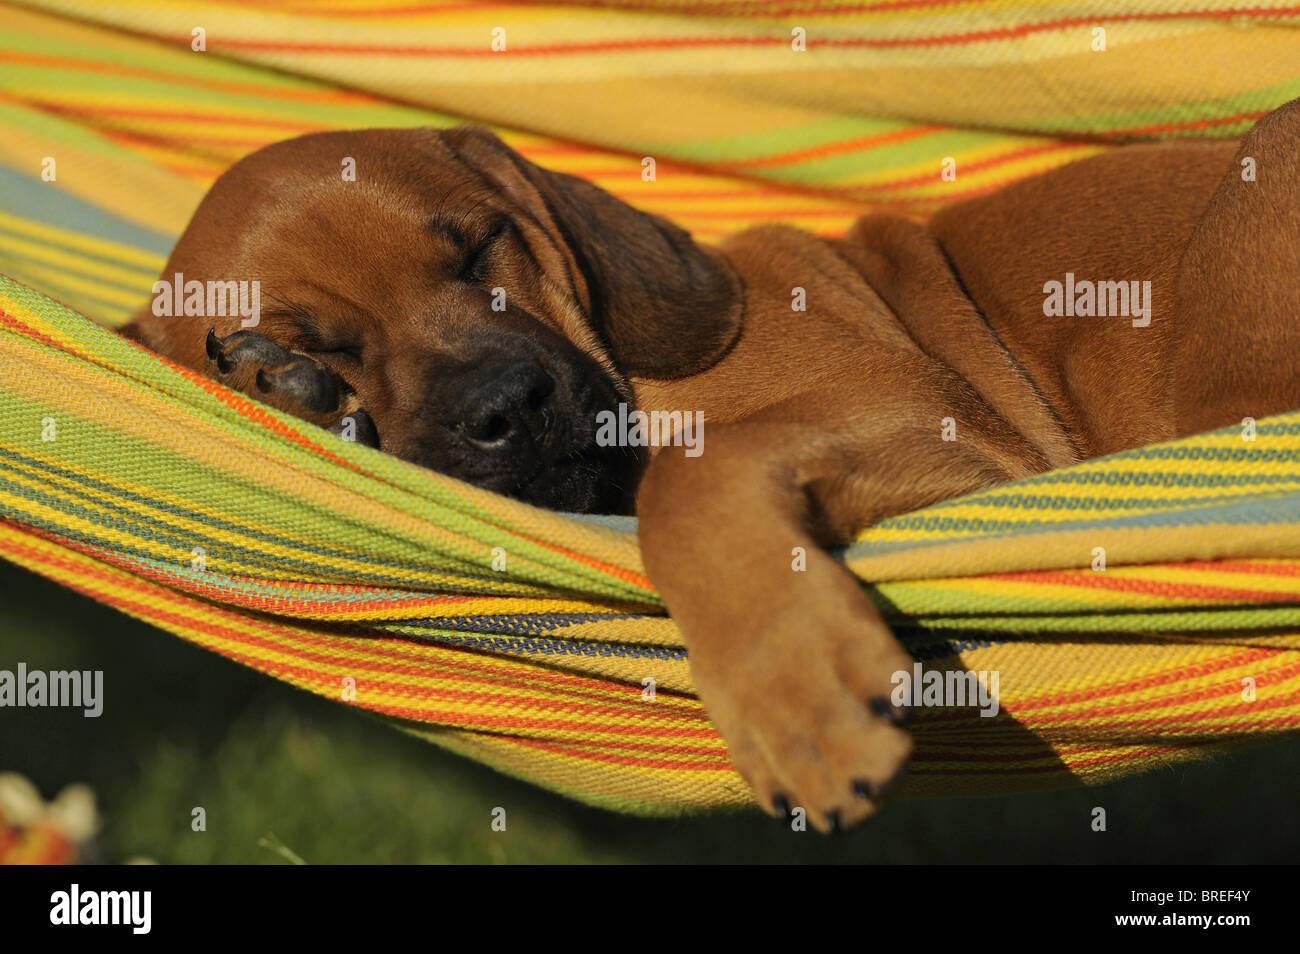 Rhodesian Ridgeback (Canis lupus familiaris). Puppy sleeping in a hammock. Stock Photo